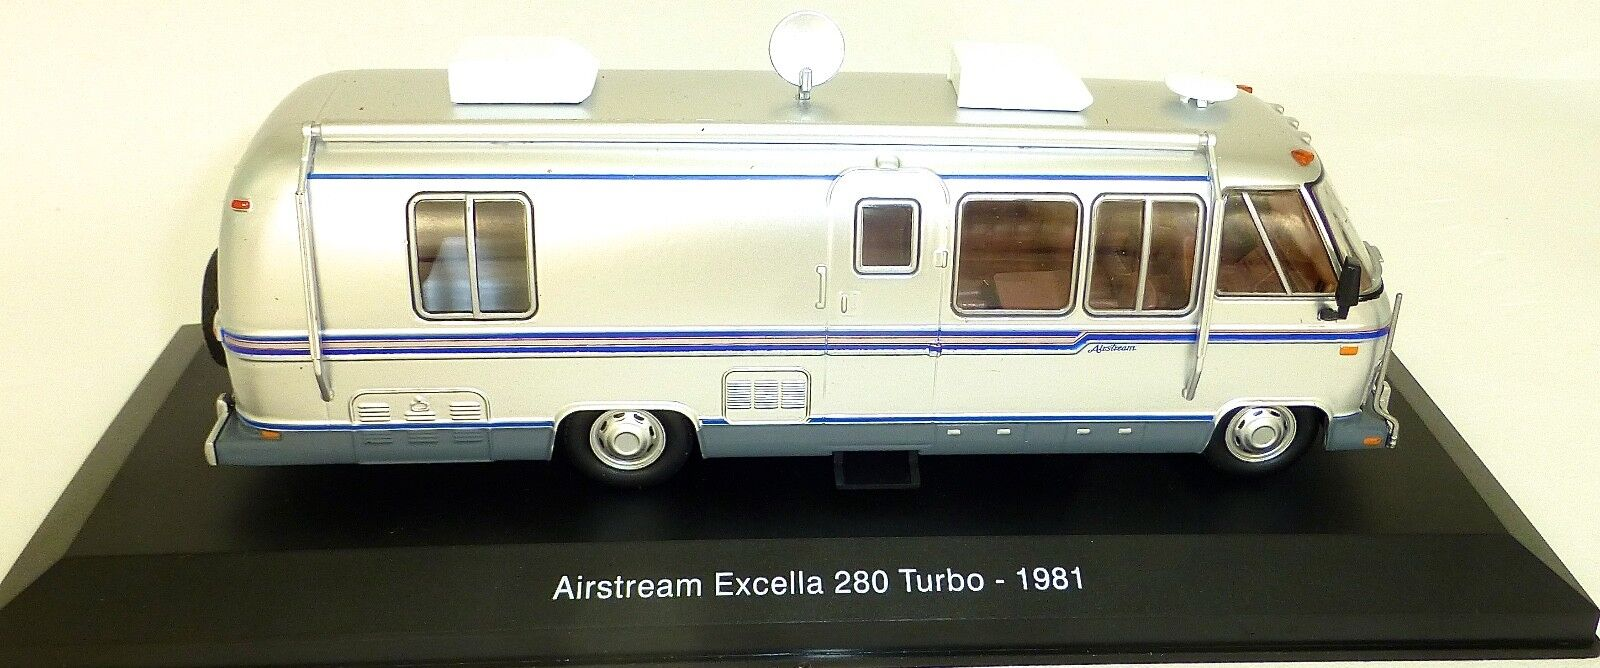 Airstream Excella 280 Turbo - 1981 ATLAS 1 43 neuf et emballé accam003 Motorhome